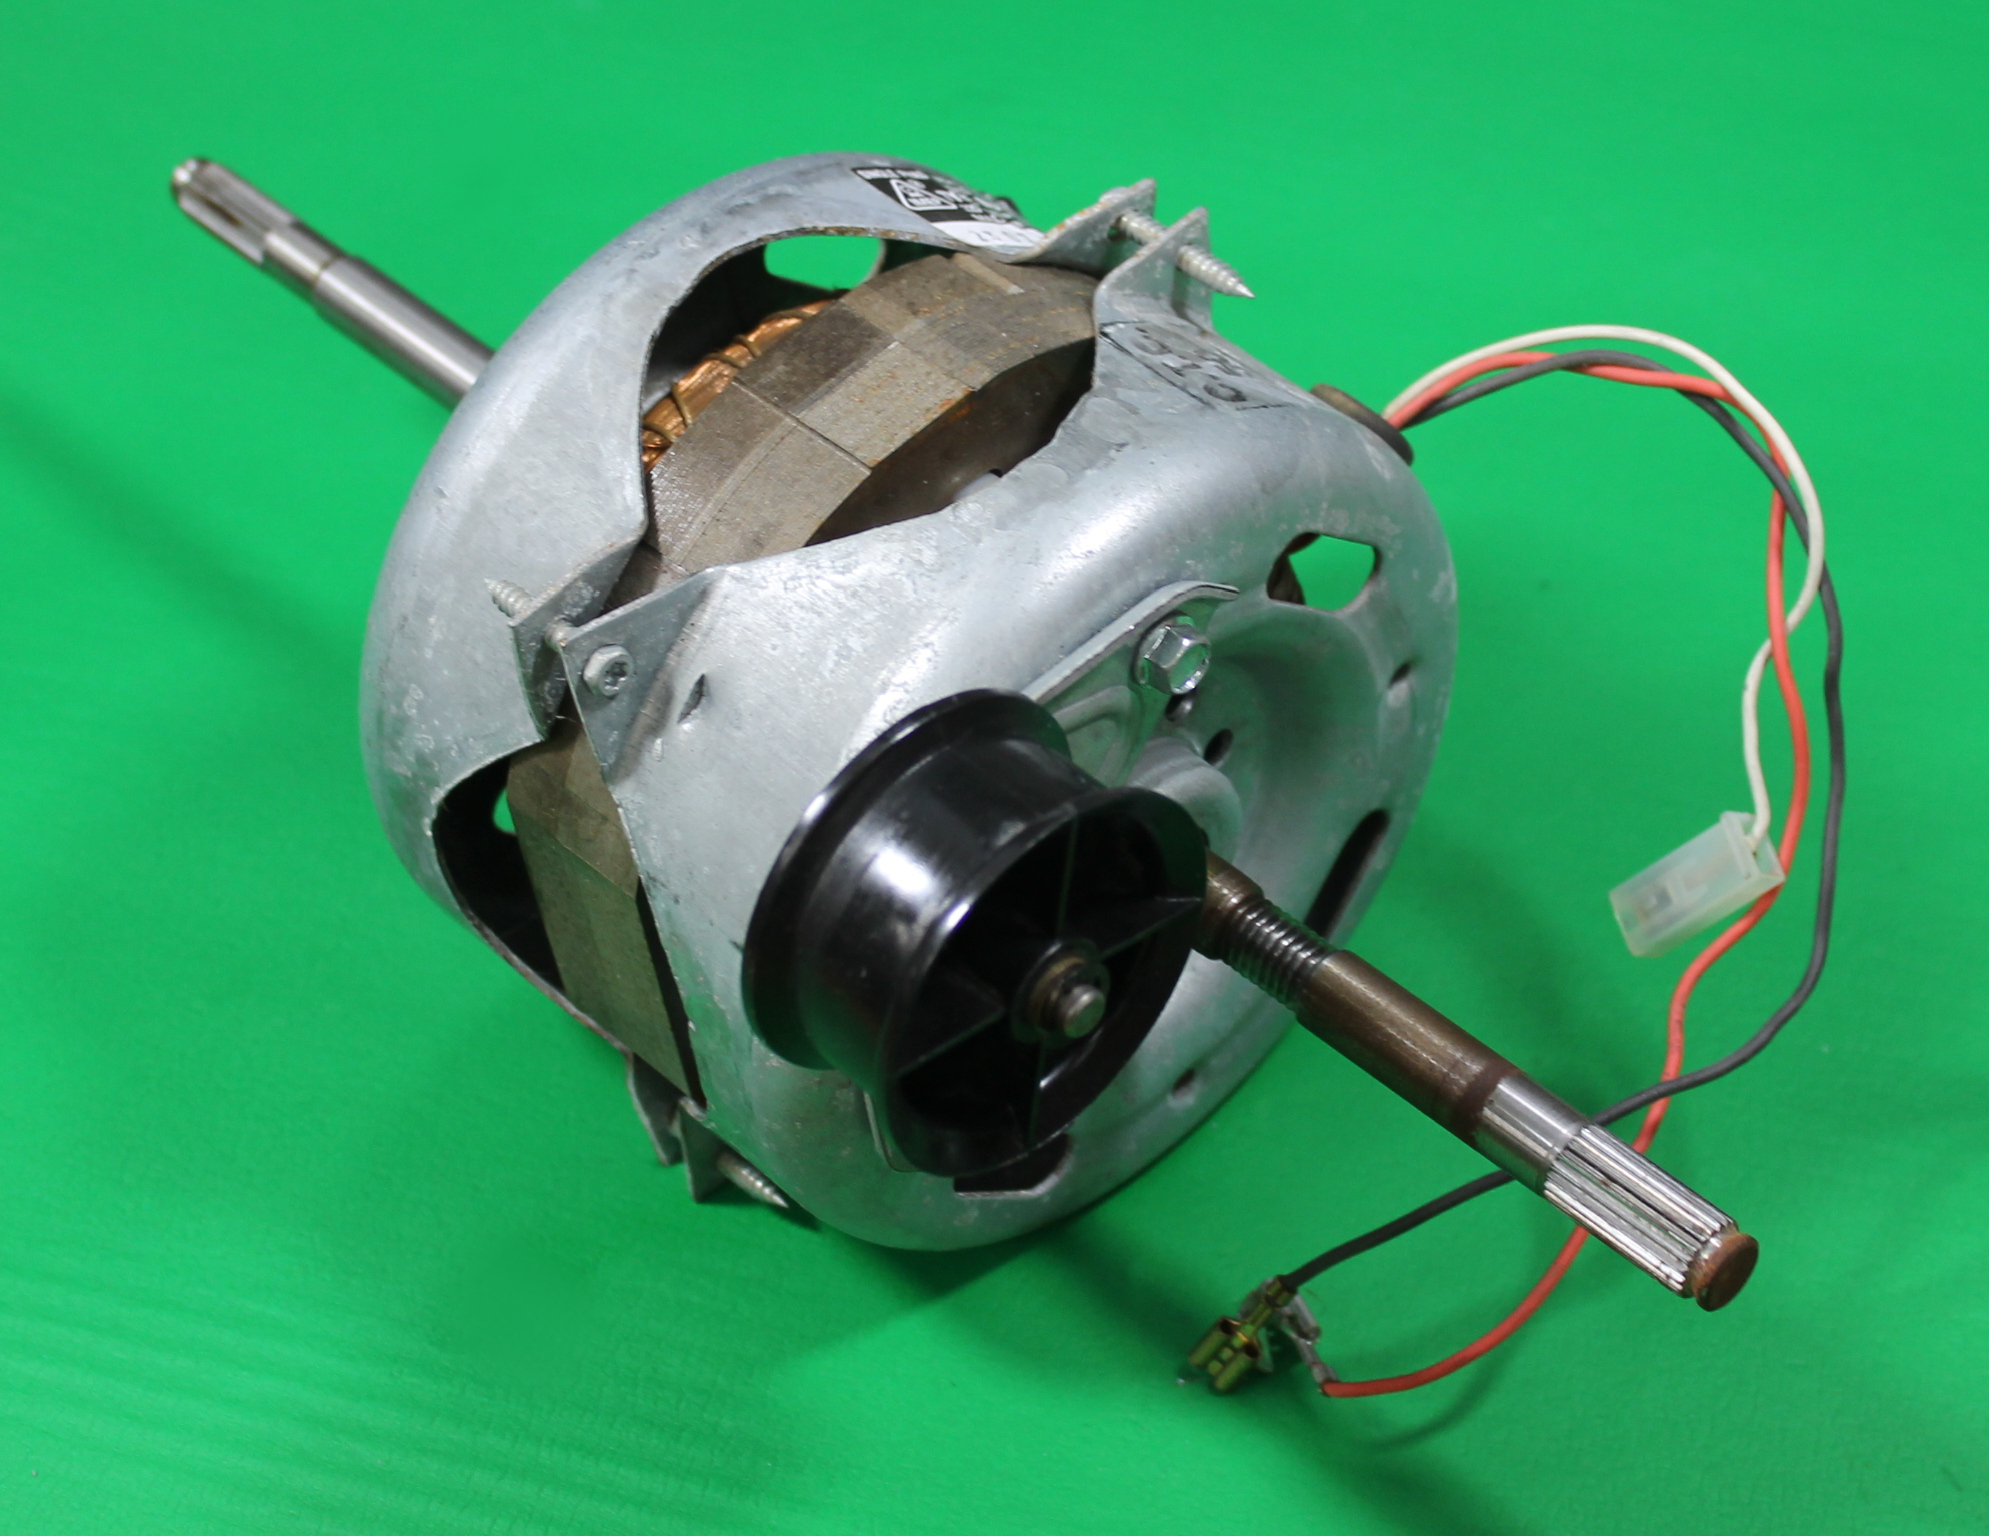 Hotpoint Tcm570 Condenser Tumble Dryer Motor